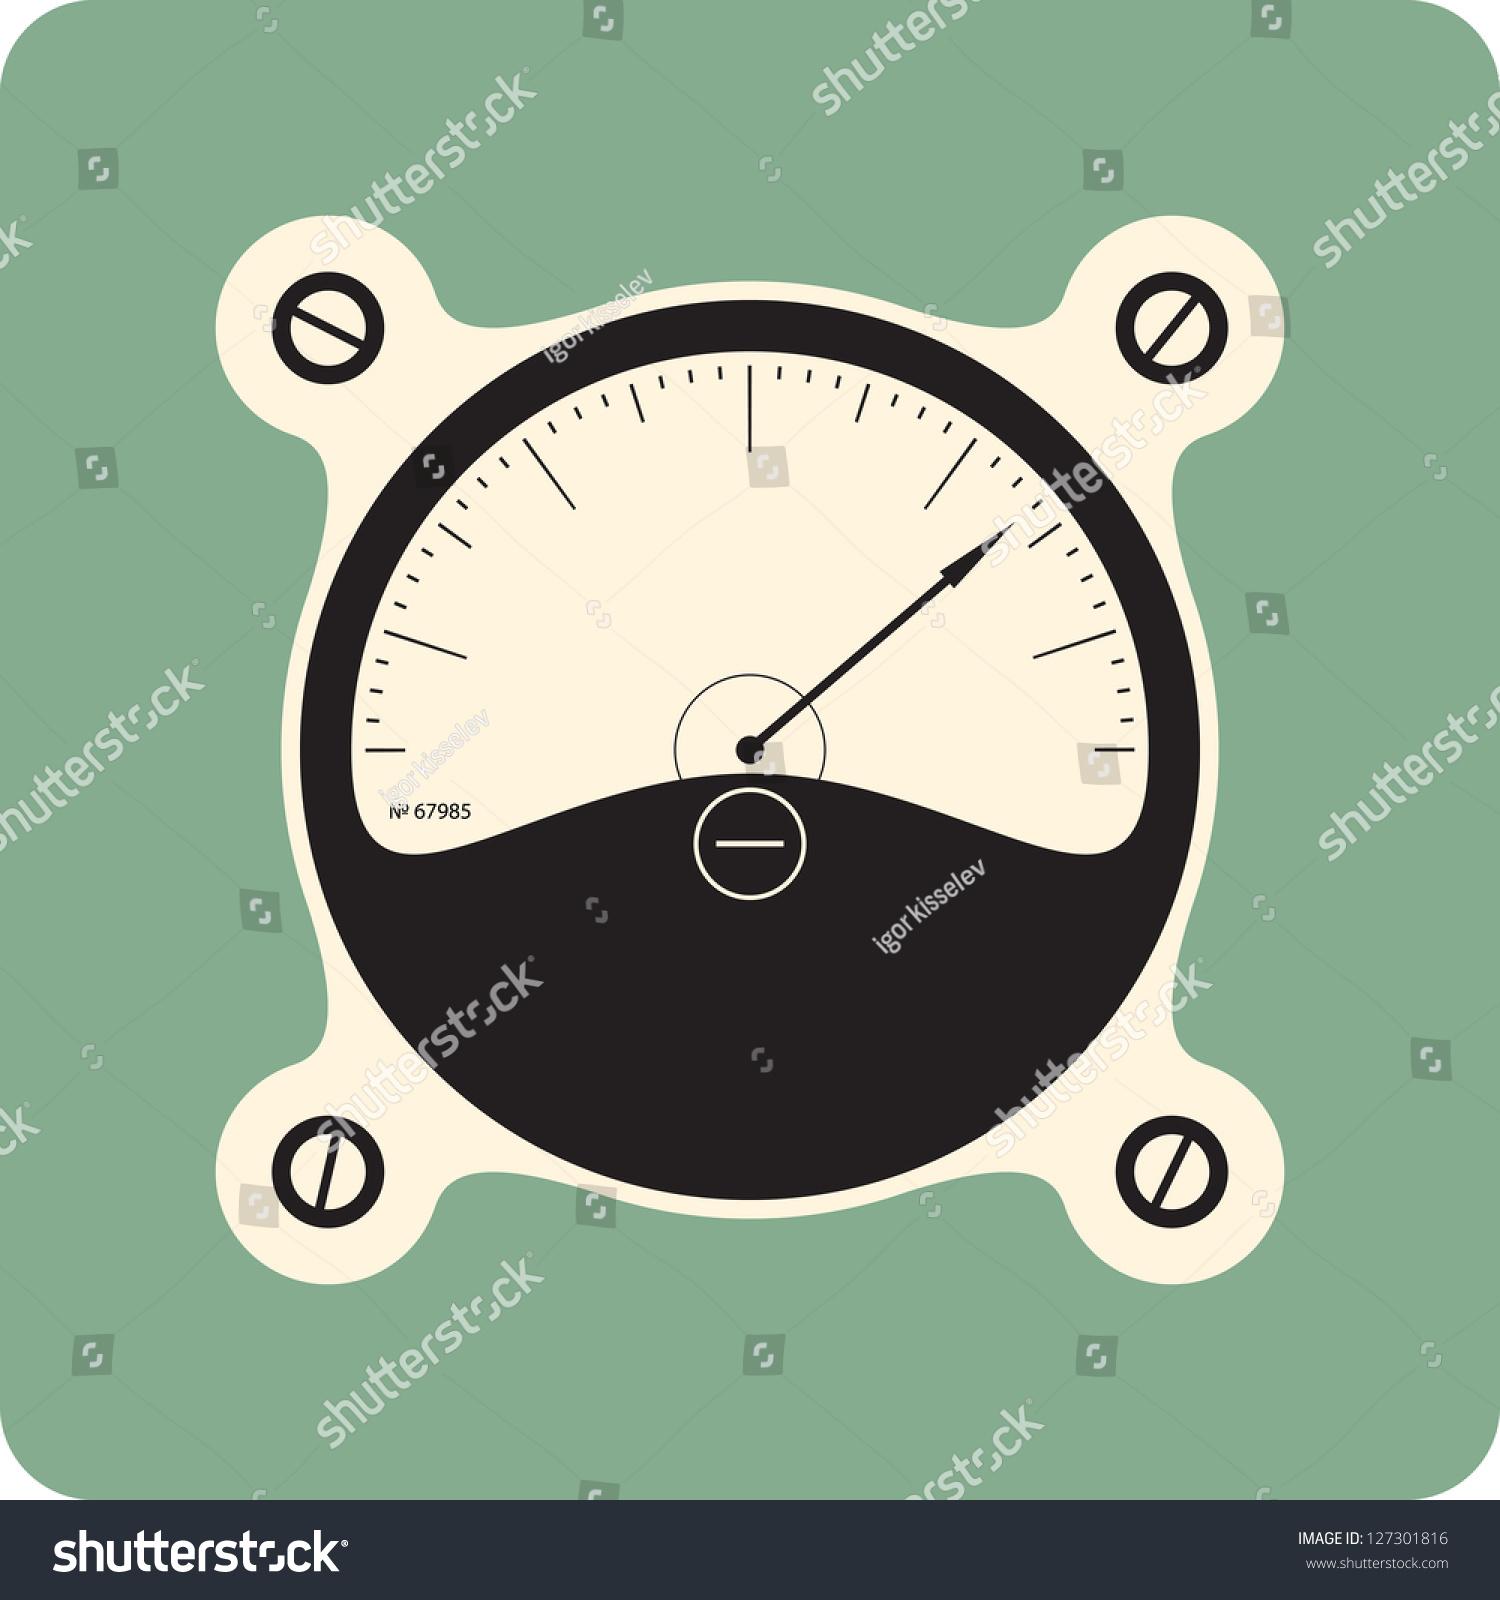 Analog Meter Background : Analog meter dial stock vector shutterstock